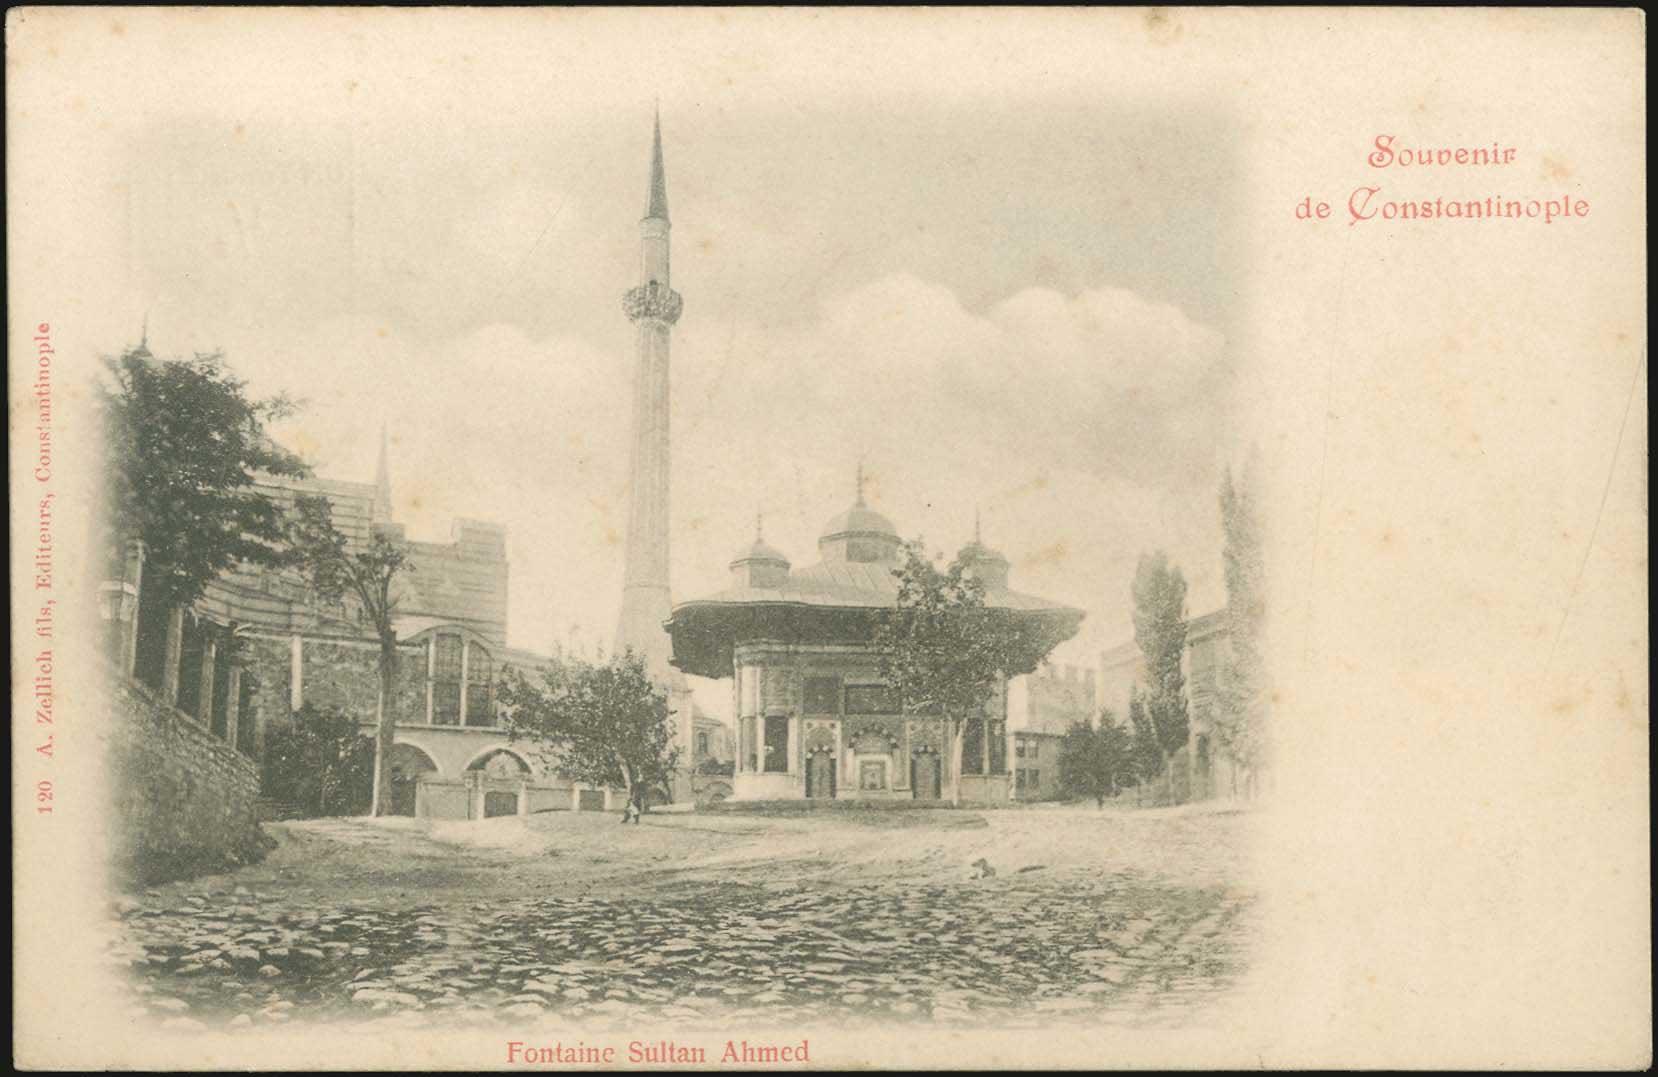 Lot 1751 - -  PICTURE POSTCARDS SMYRNE, CONSTANTINOPLE, ASIA MINOR -  A. Karamitsos Public & Live Internet Auction 675